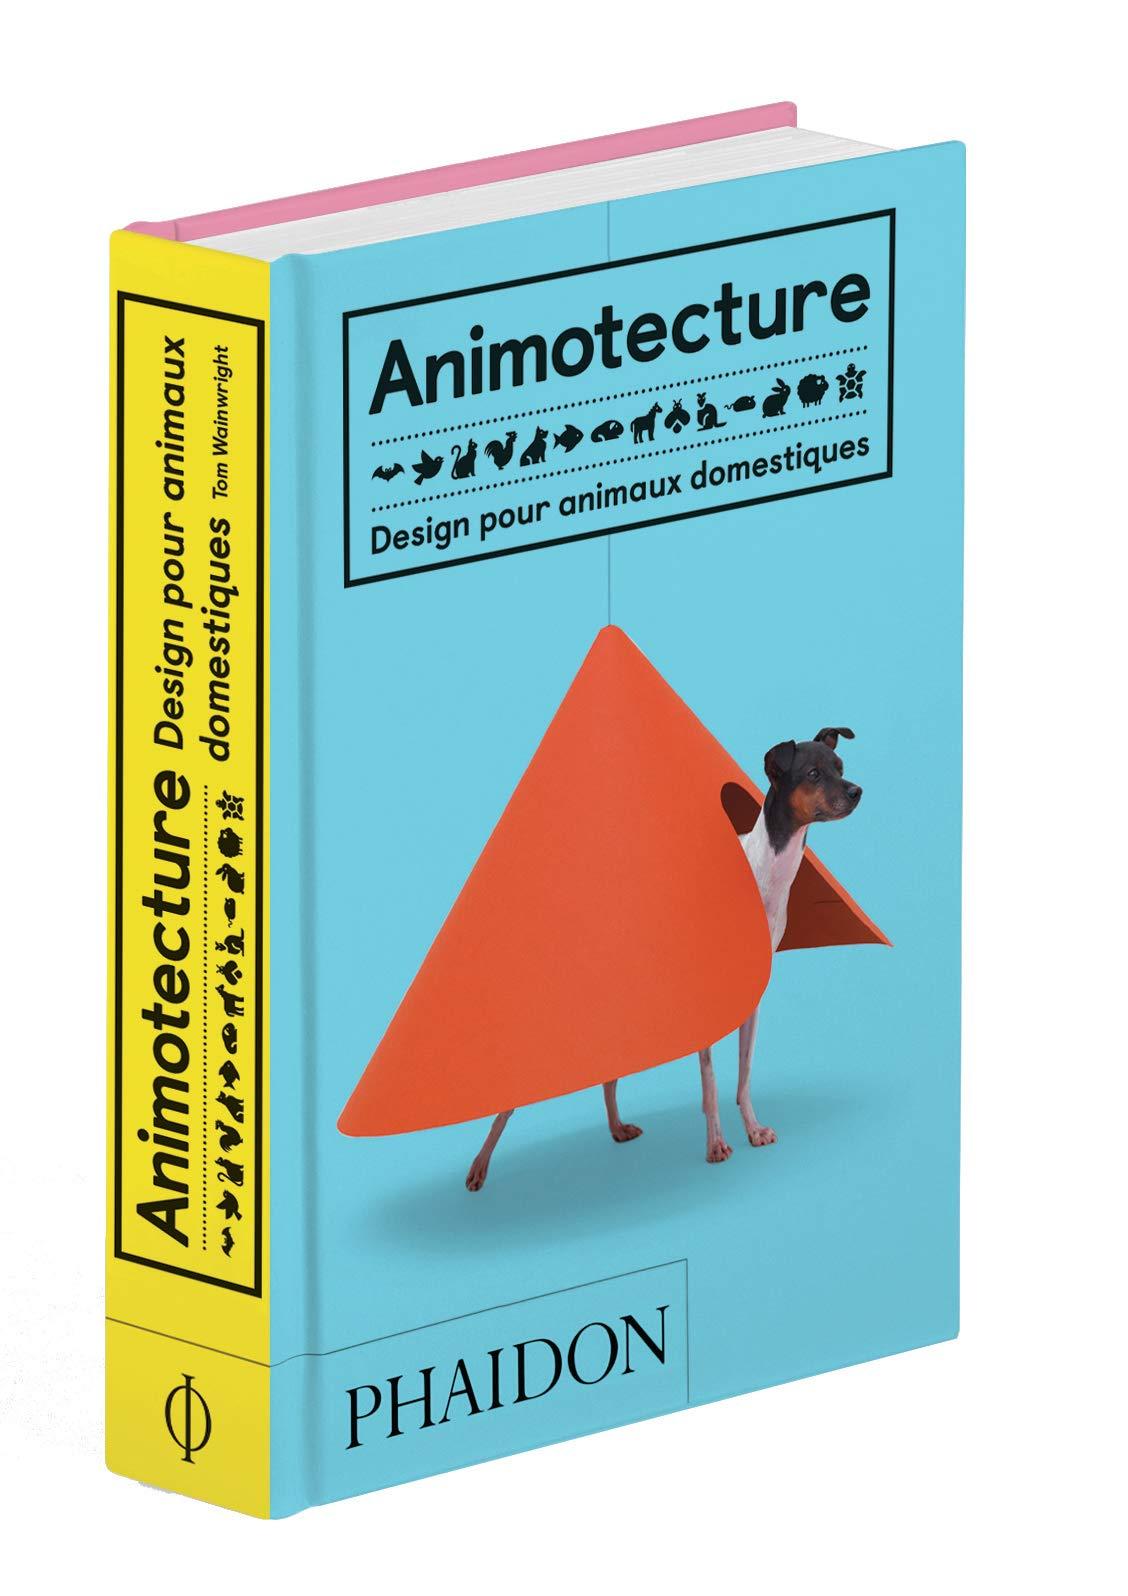 Amazon.fr - Animotecture : Design pour animaux domestiques - Wainwright,  Tom, Debon, Emmanuelle, Maylin, Jeanne - Livres